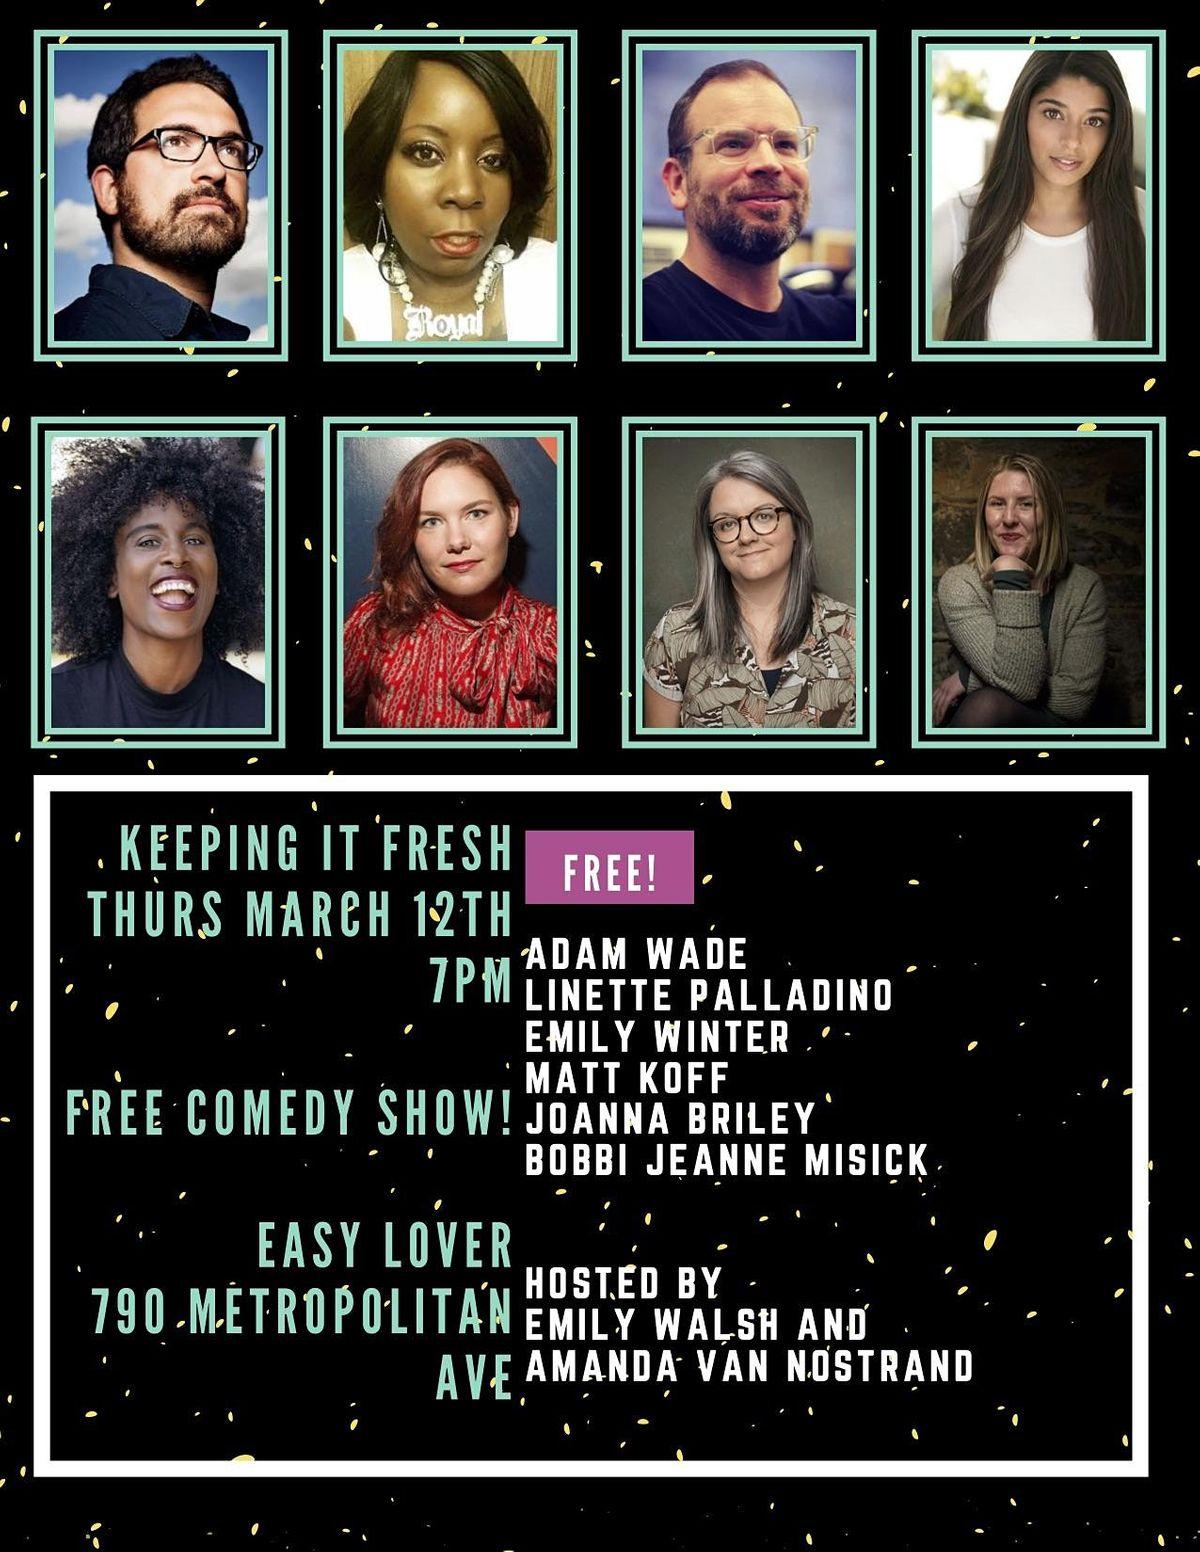 Keeping it Fresh!  A Comedy Show